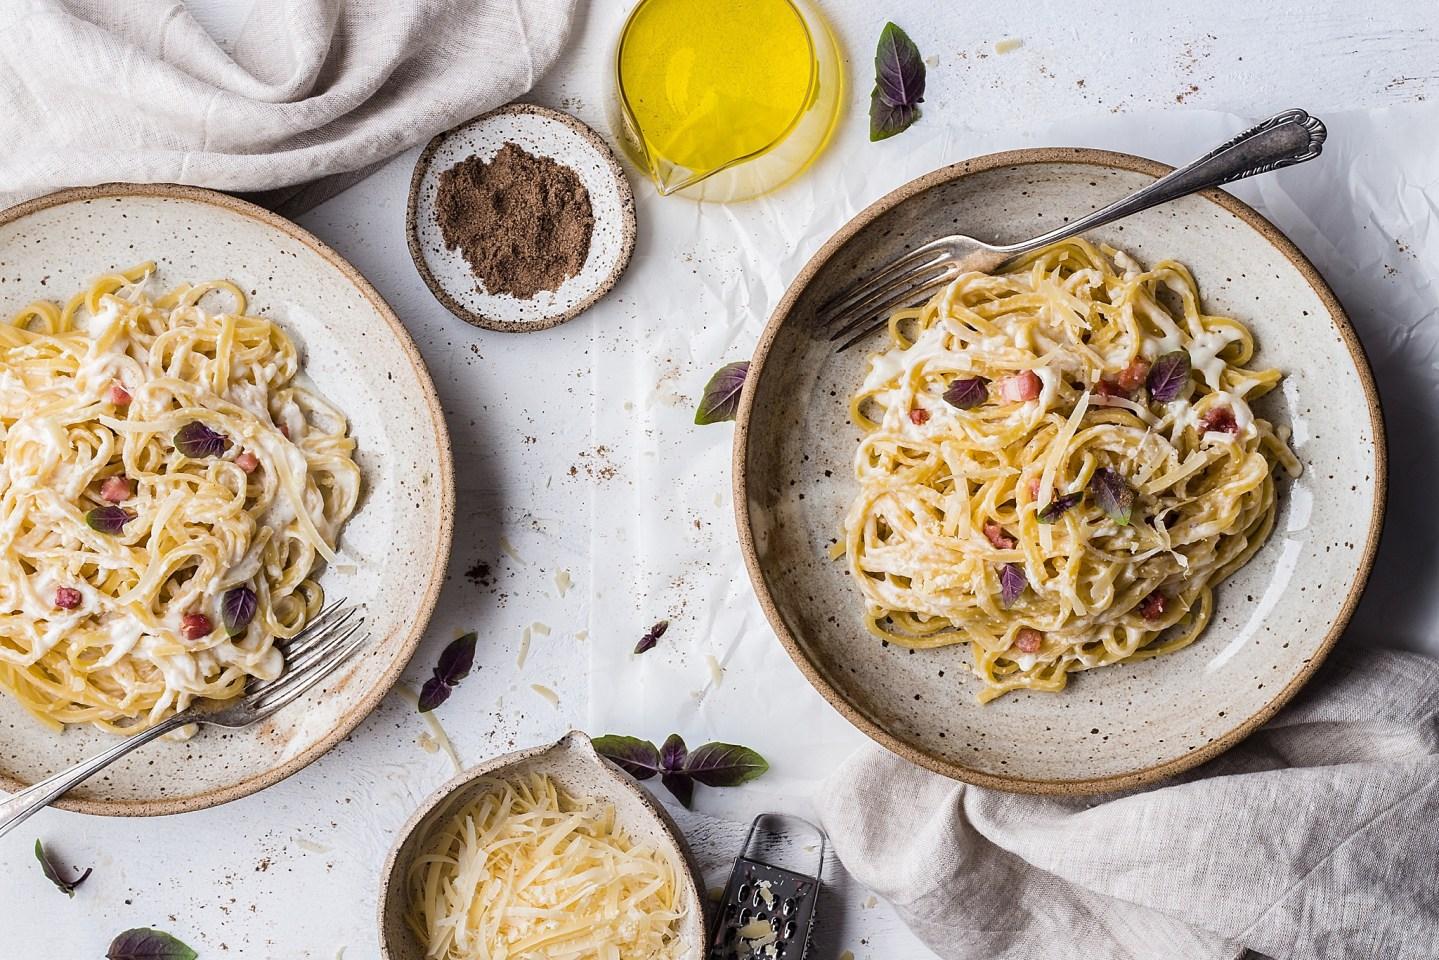 Best Pasta in London: Padella or Pastaio?